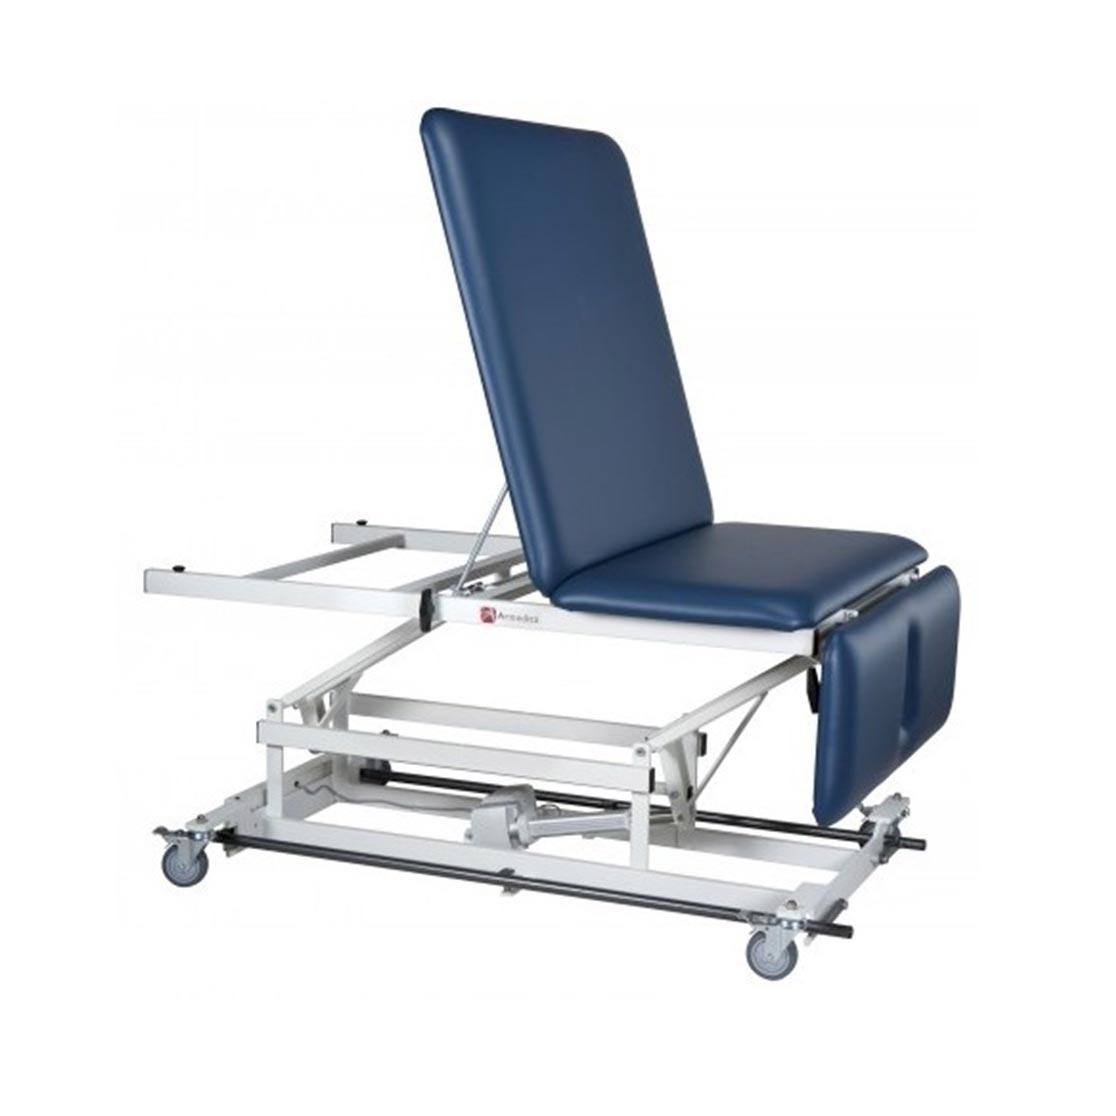 Armedica AM-BA 340 bariatric treatment table